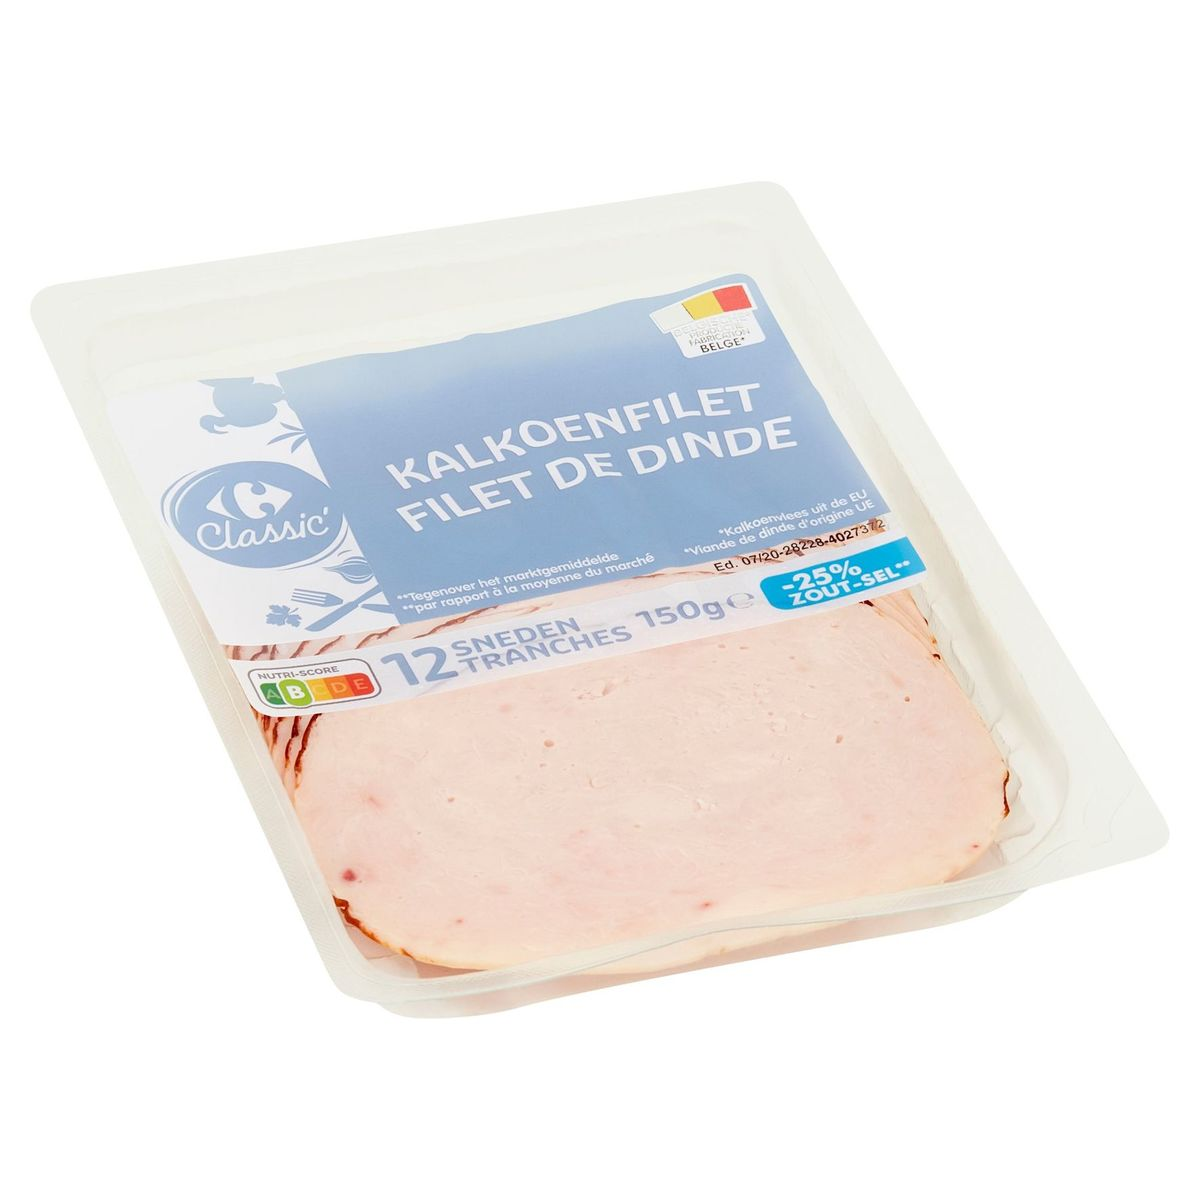 Carrefour Classic' Kalkoenfilet 12 Sneden 150 g